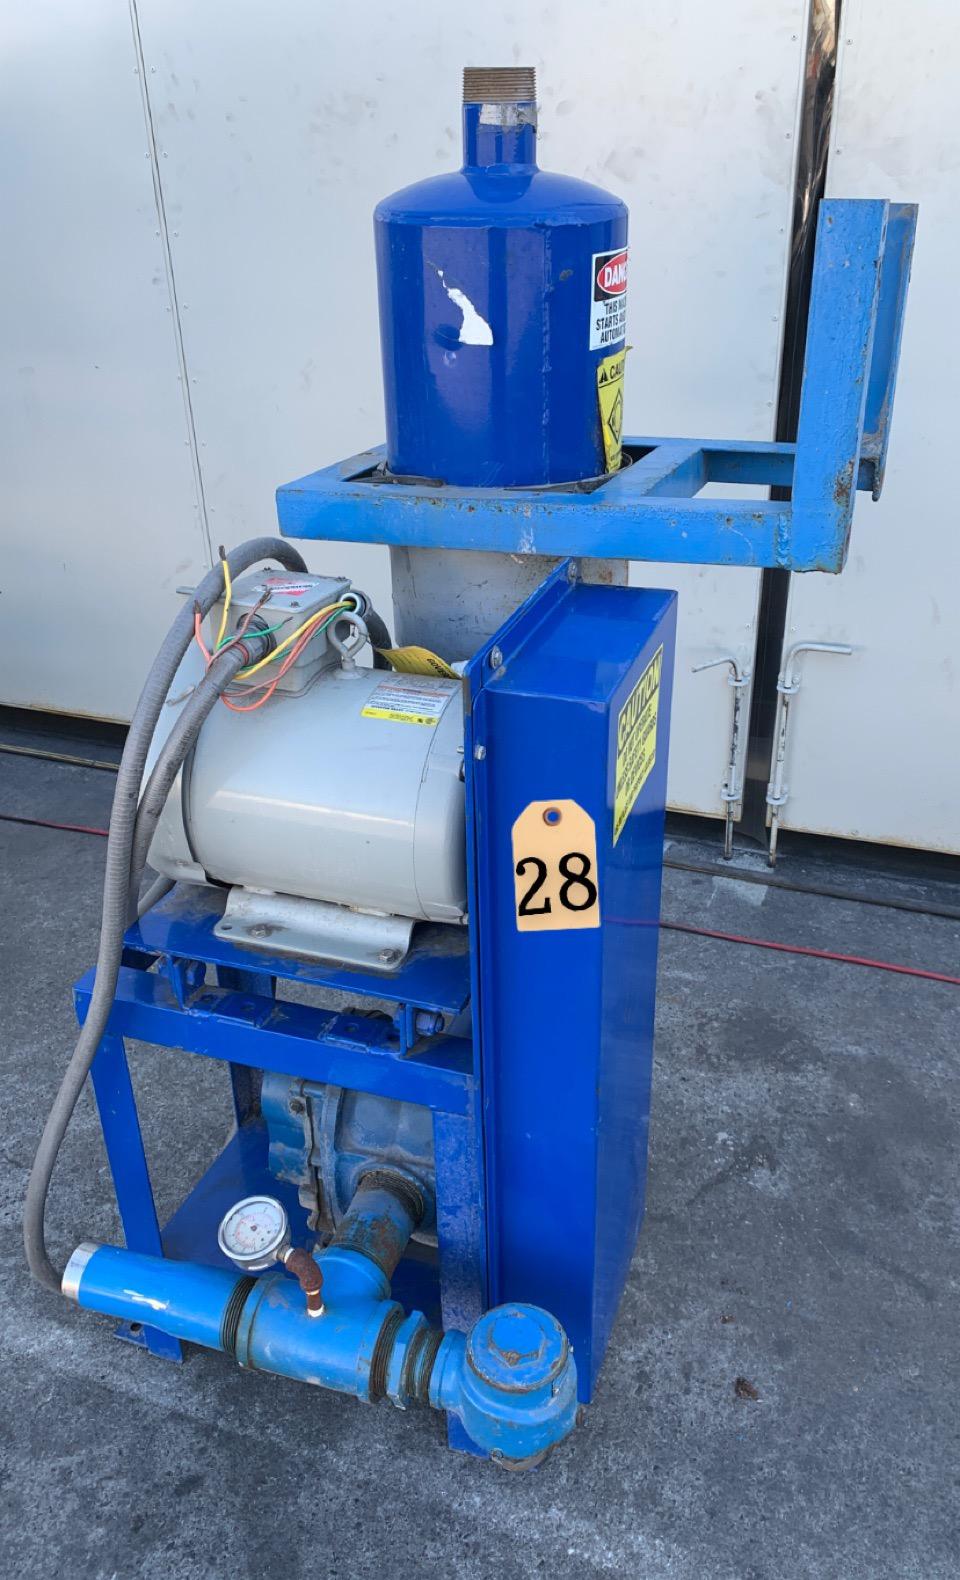 7.5 hp PNEU-CON CONVEYOR w/ DRESSER ROOTS ROTARY LOBE BLOWER